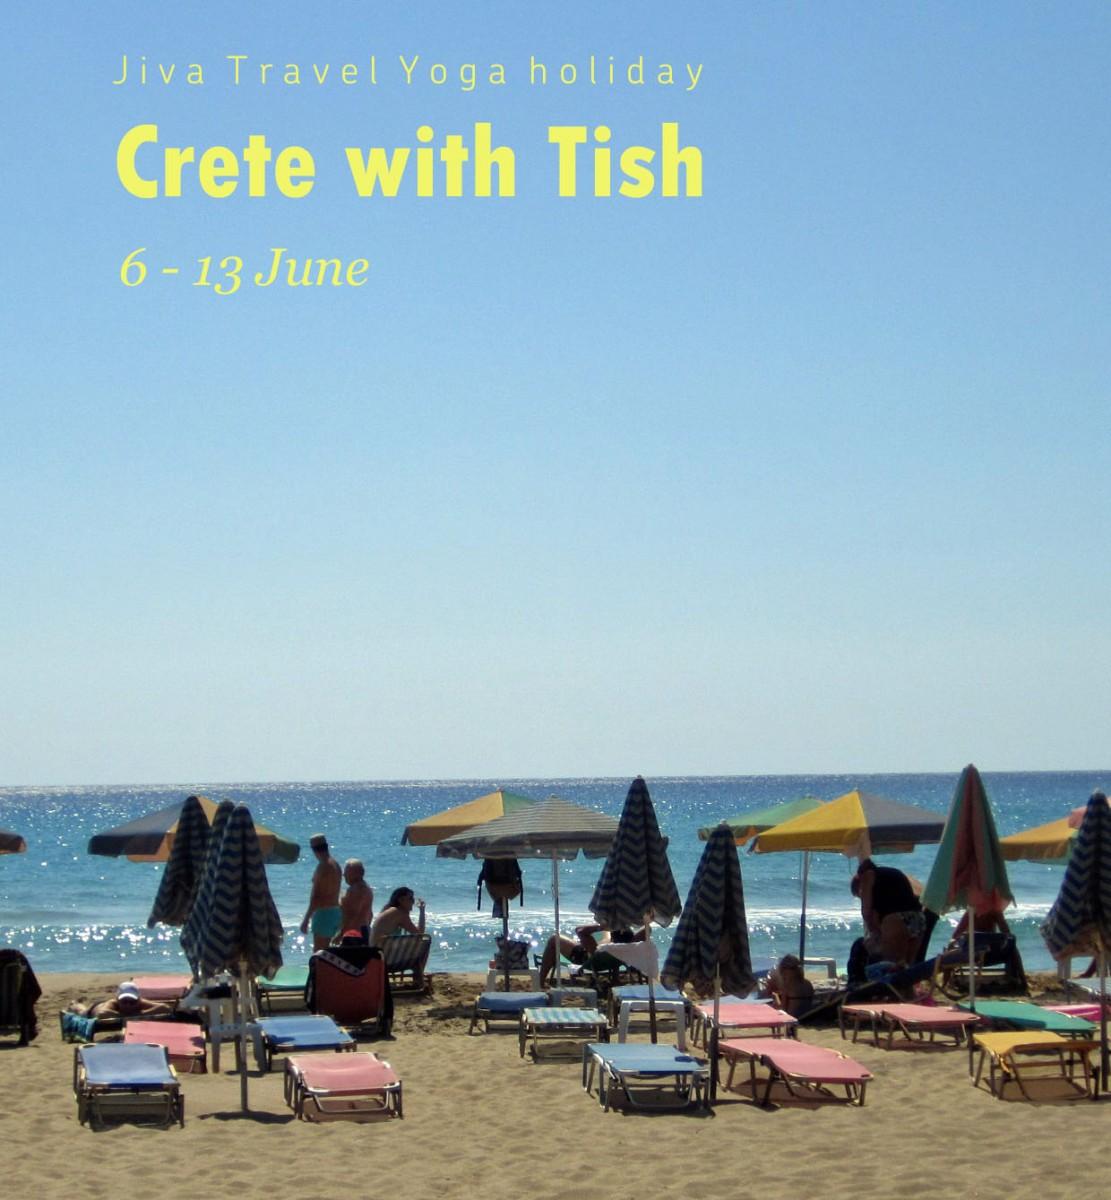 Crete With Tish